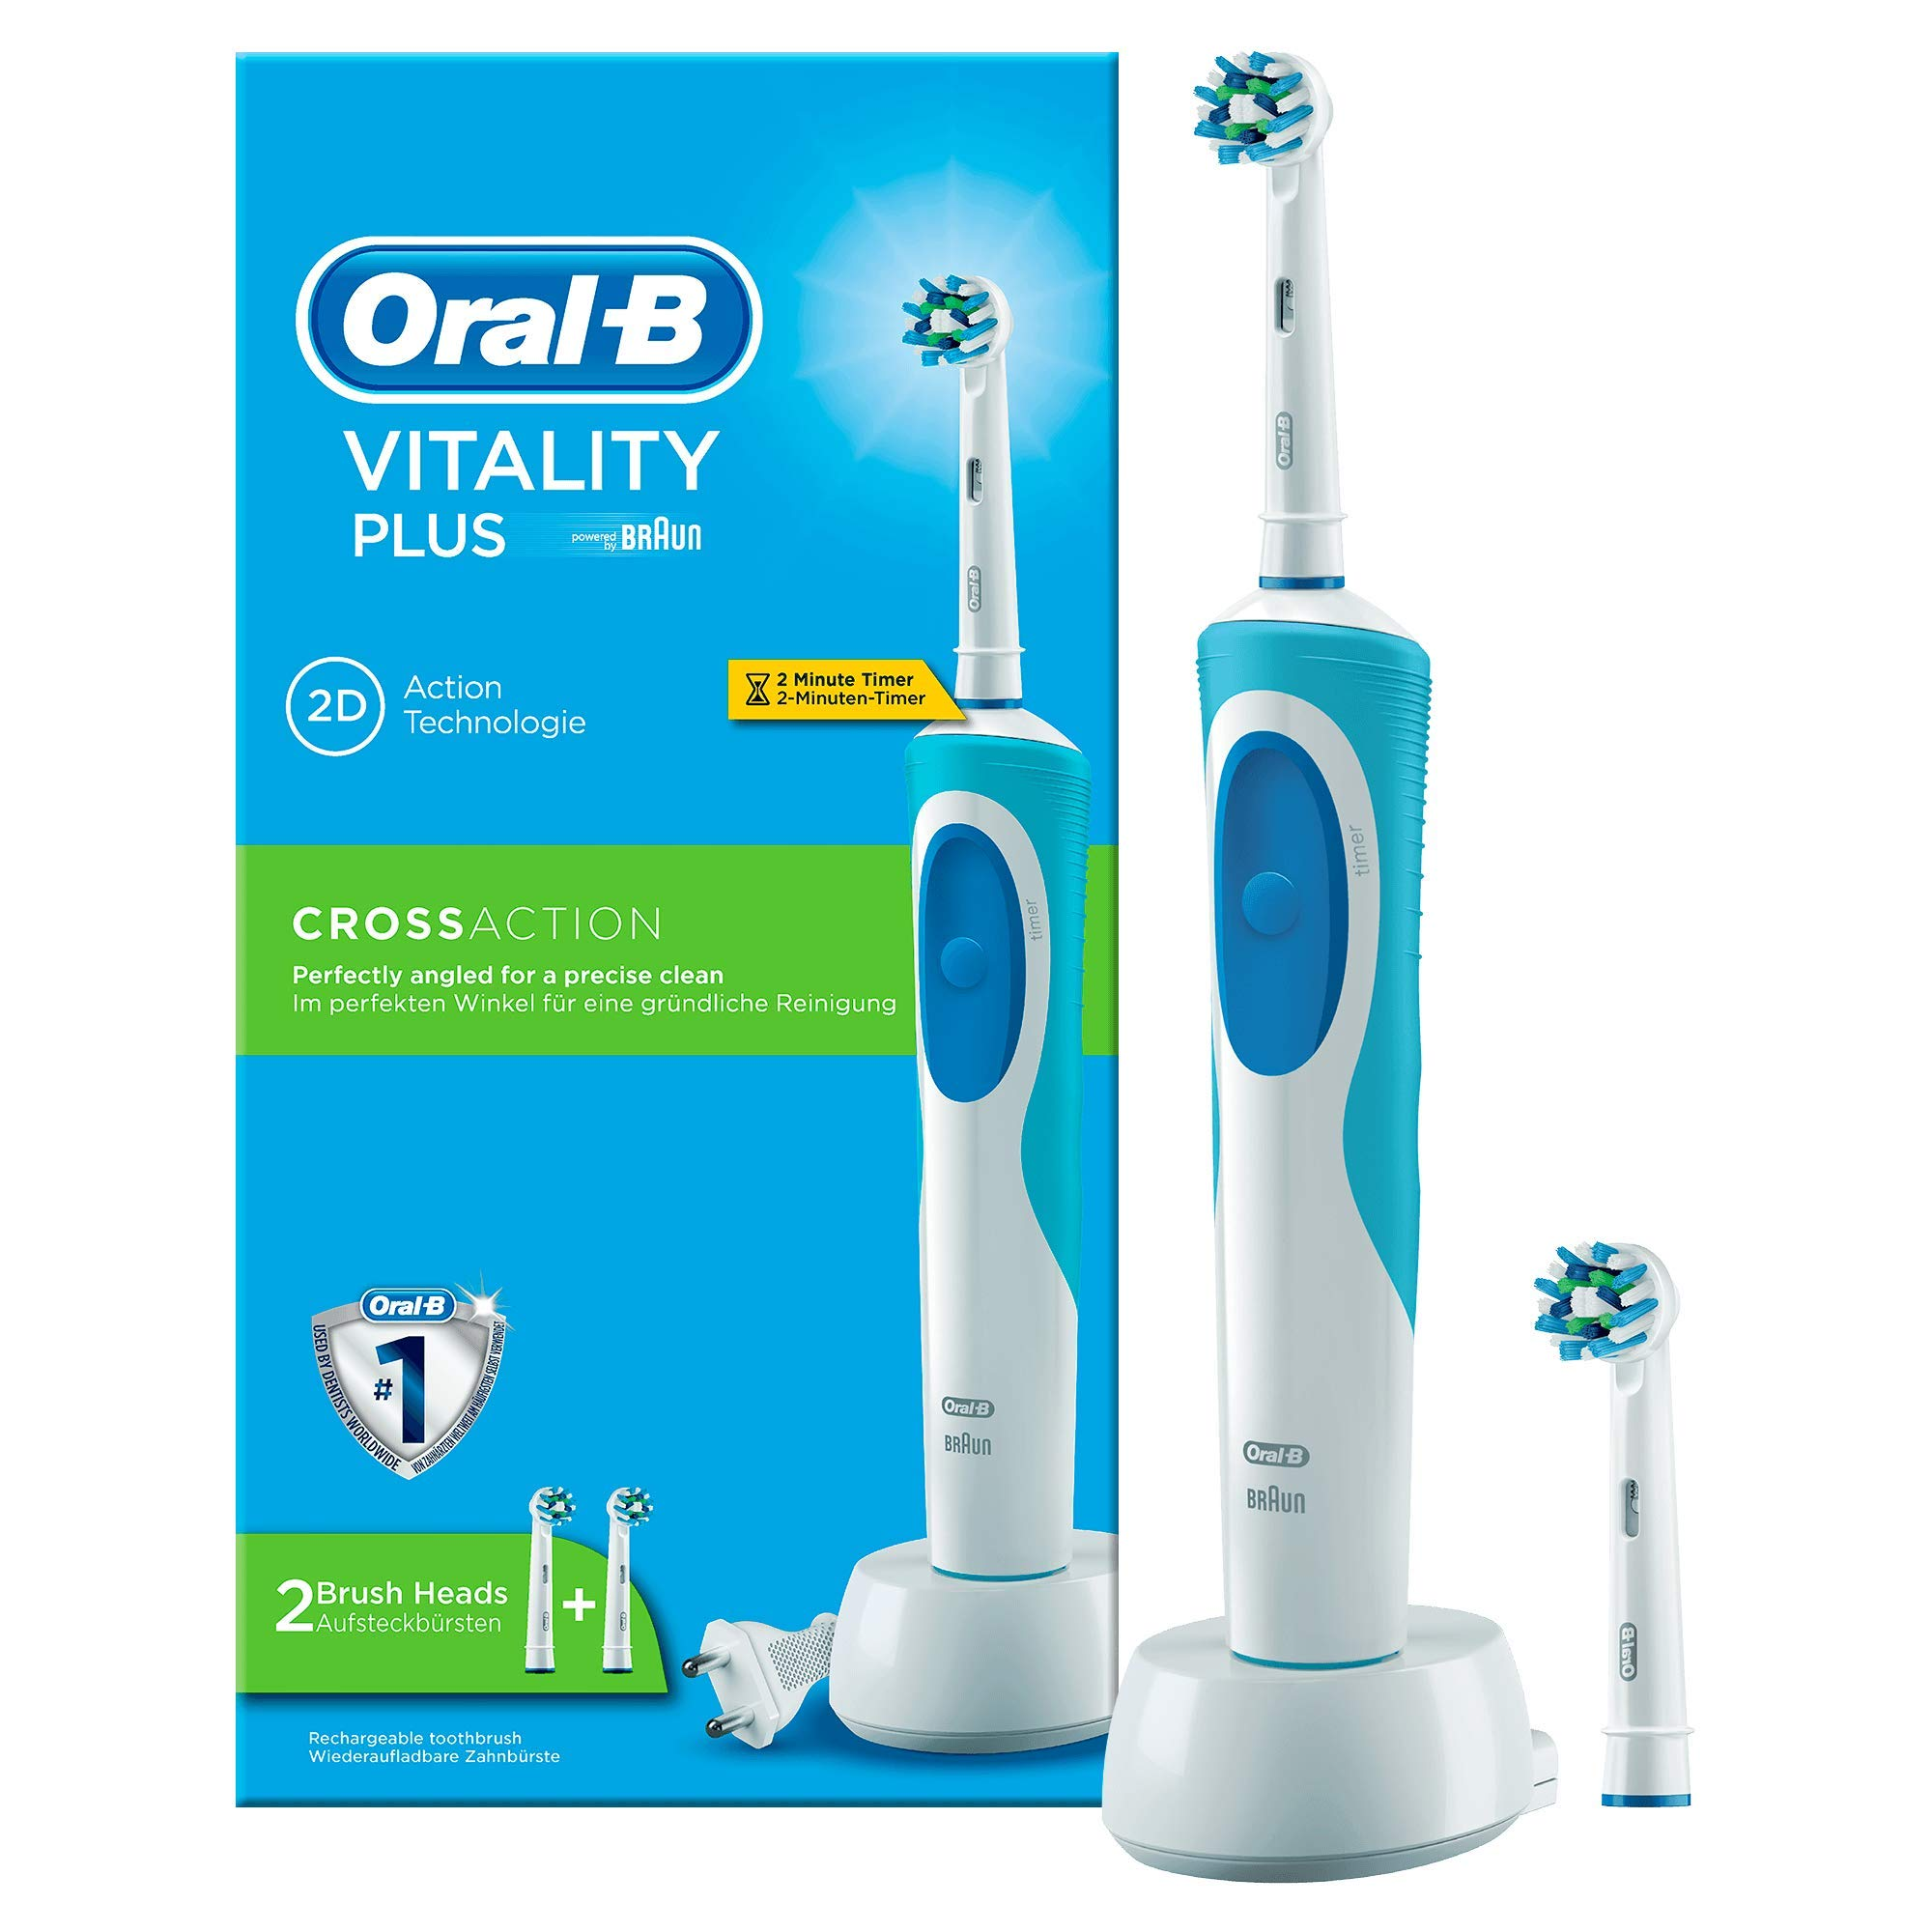 Oral-B Vitality CrossAction Cepillo de Dientes Eléctrico Recargable Con Tecnología Braun product image